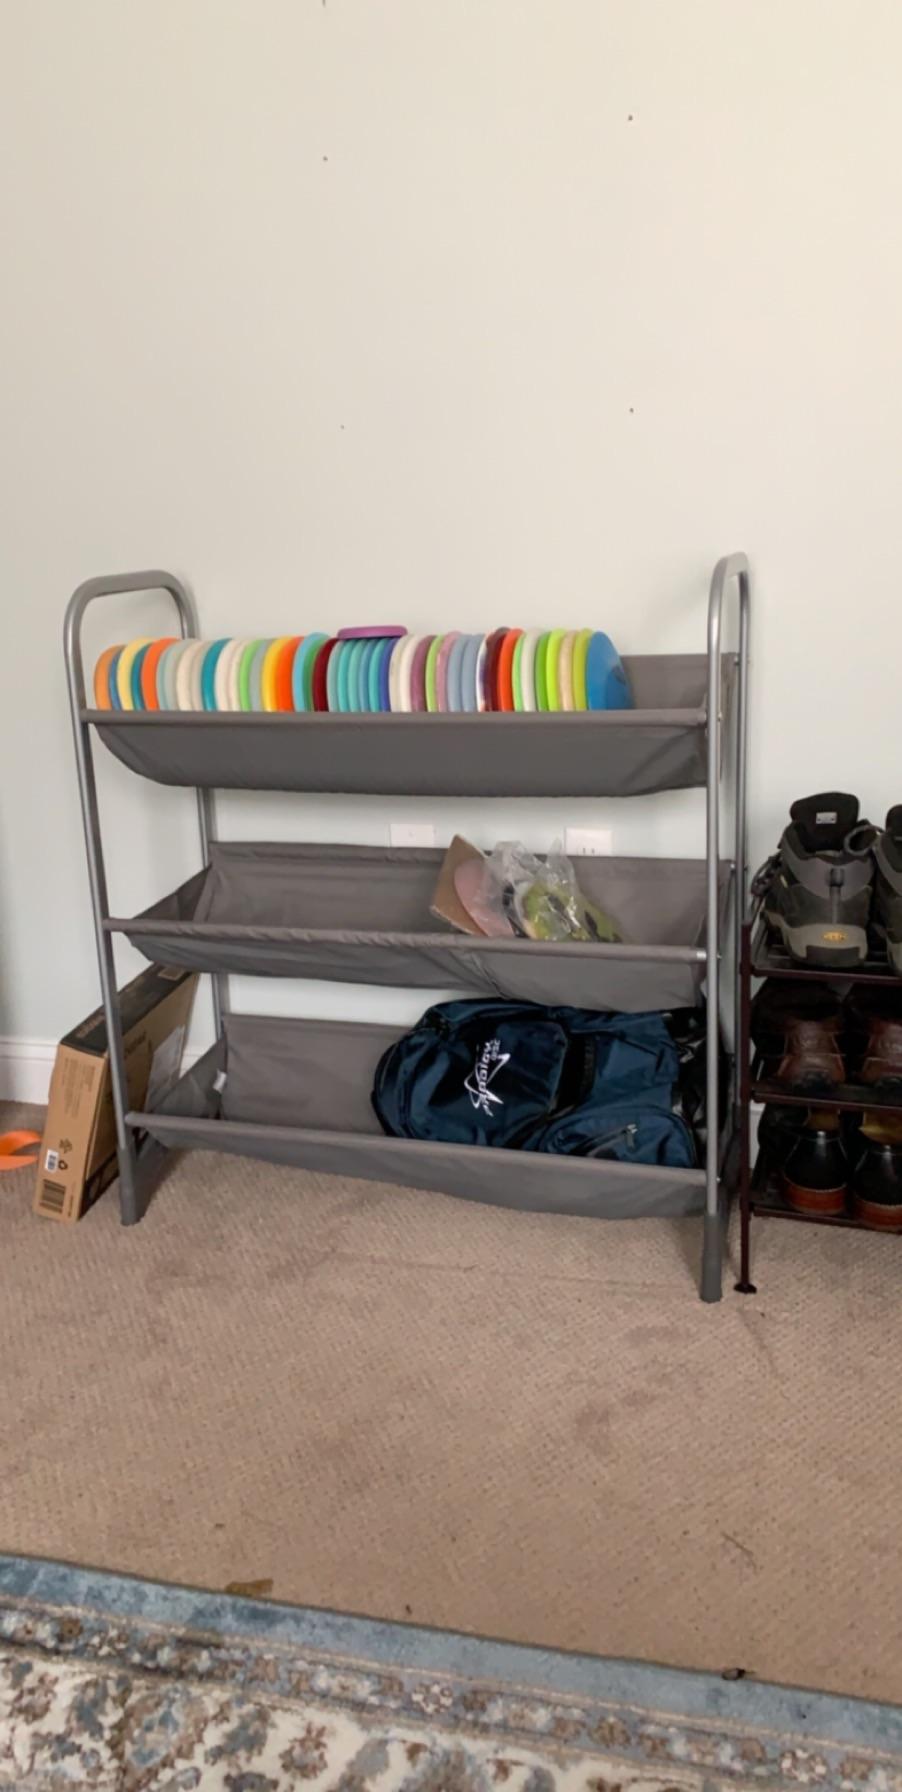 disc golf storage perfect rack to keep